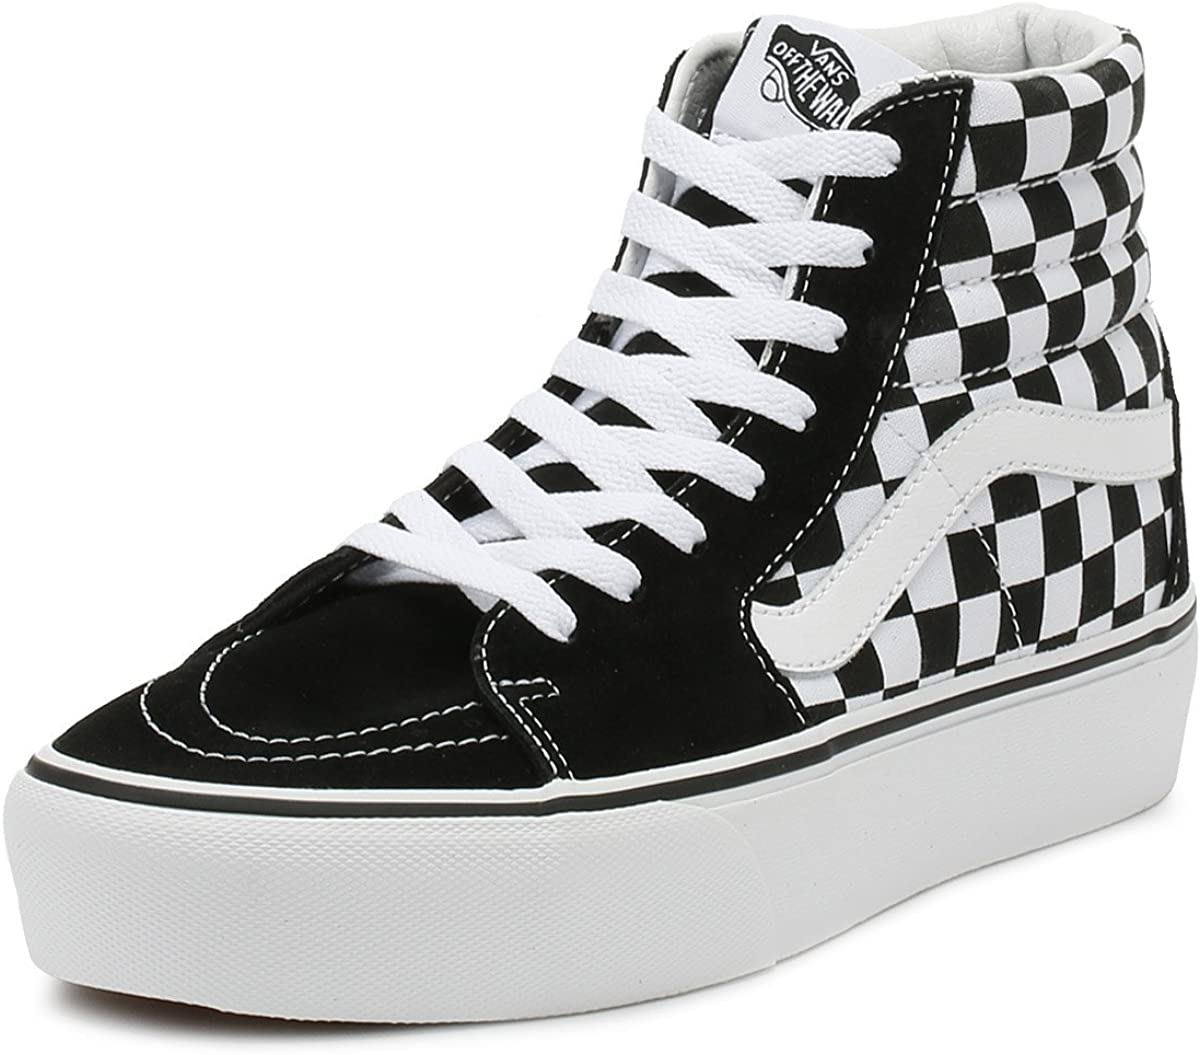 vans platform checkerboard